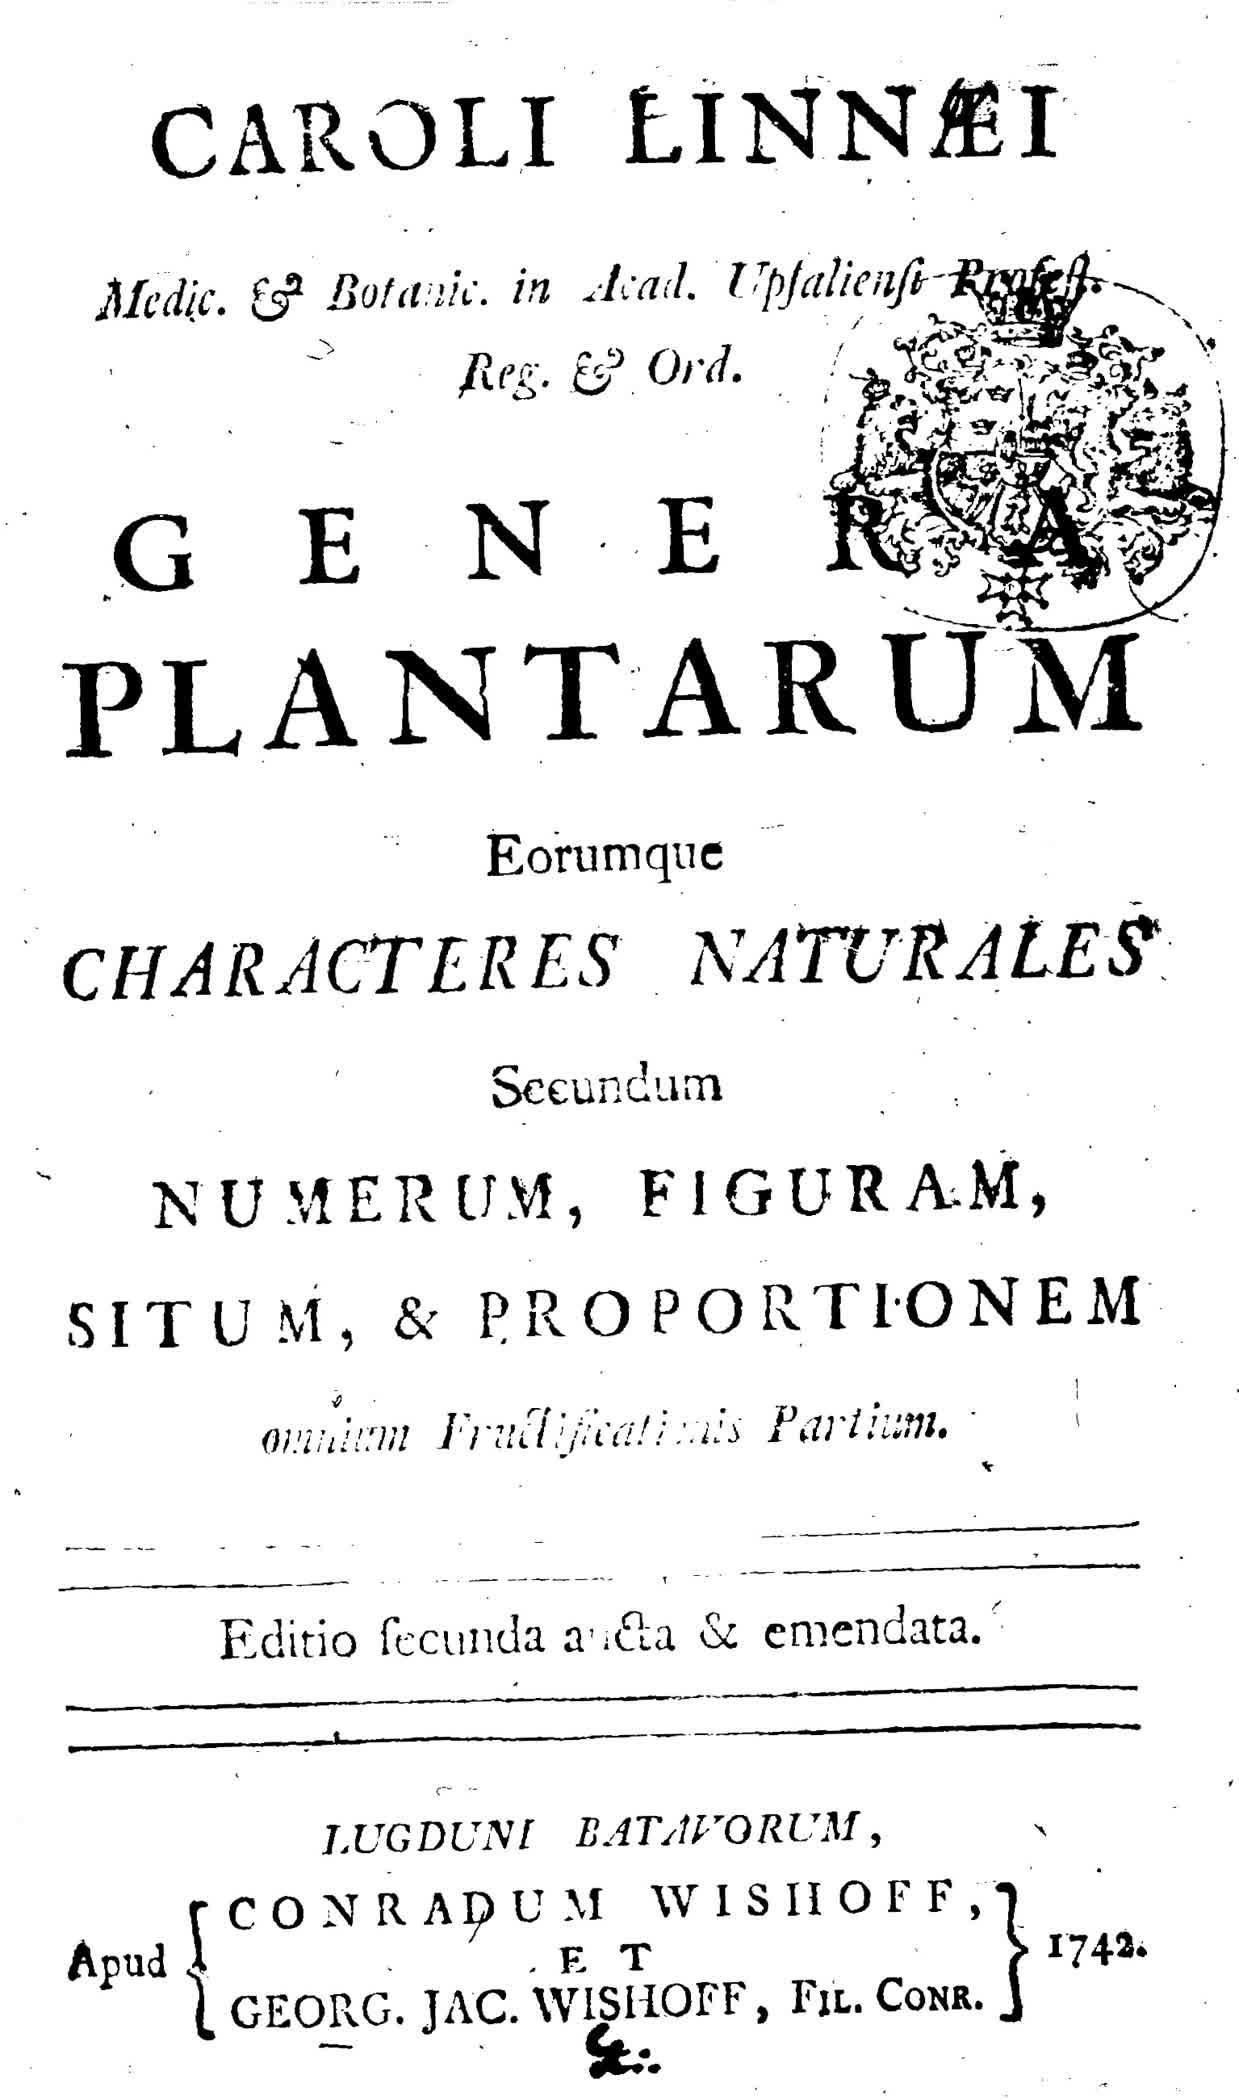 Carl Linnaeus, 1742, Genera Plantarum